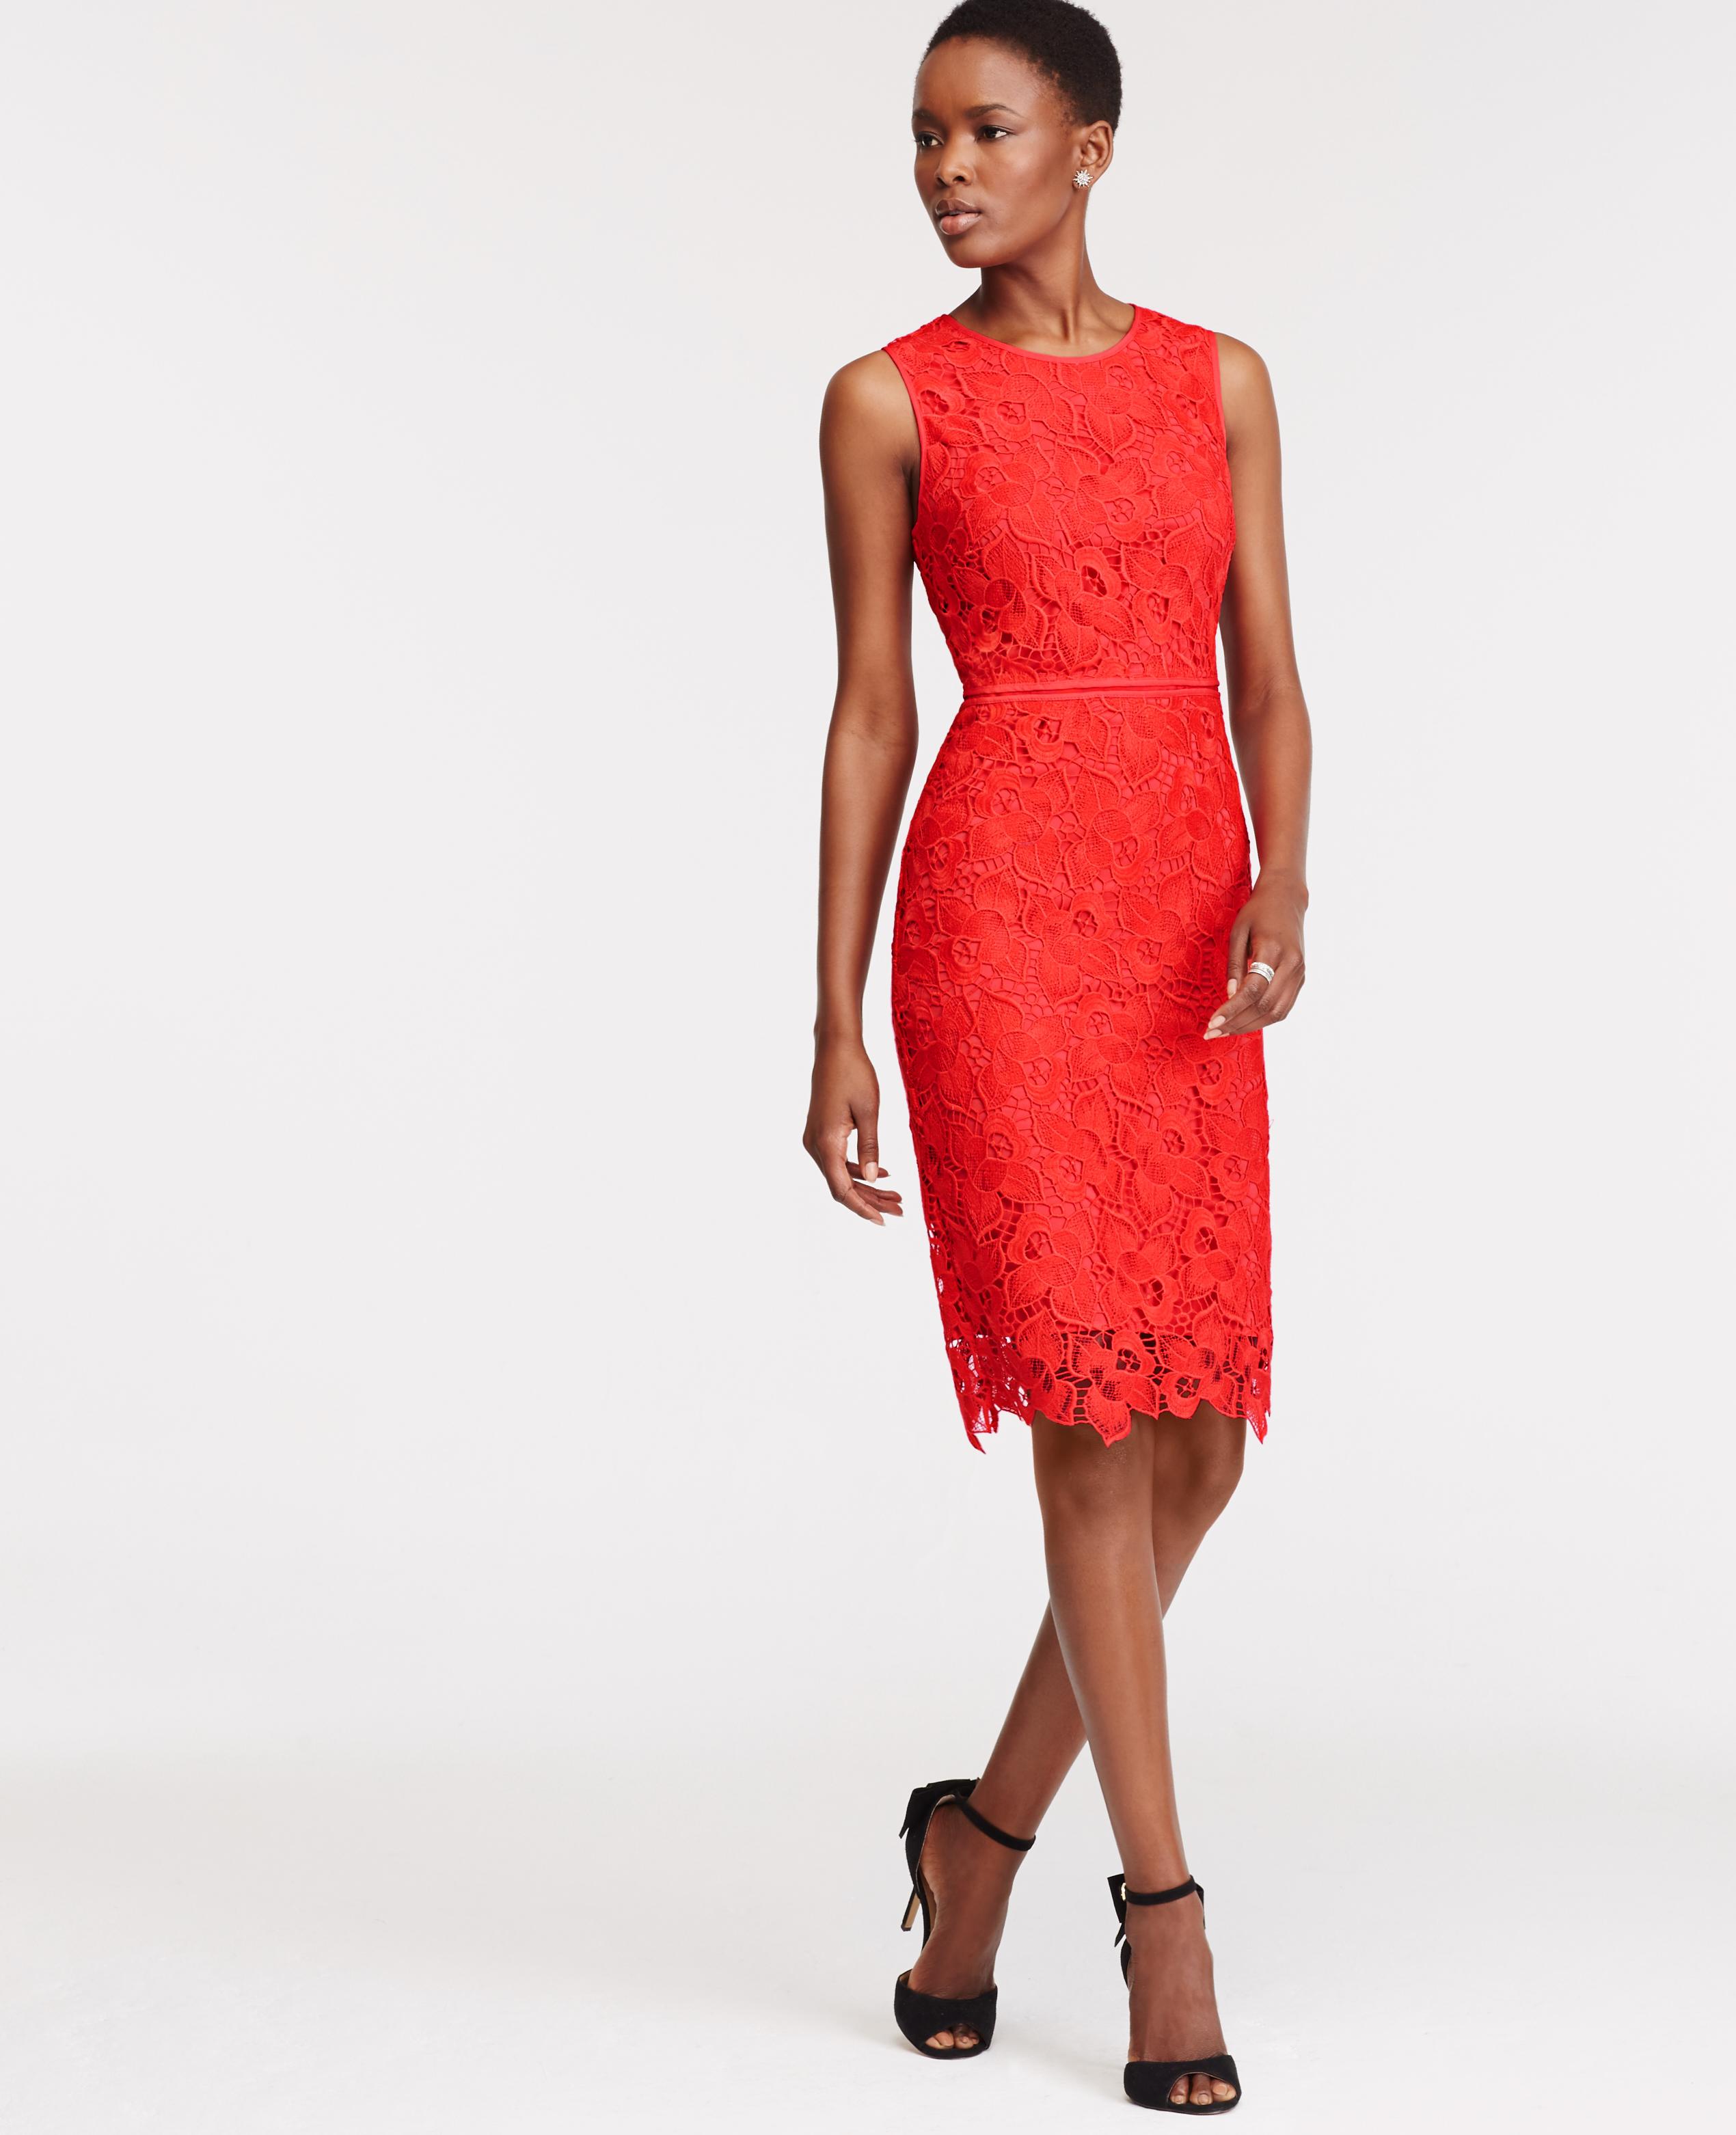 Lyst - Ann Taylor Tall Floral Lace Sheath Dress in Orange